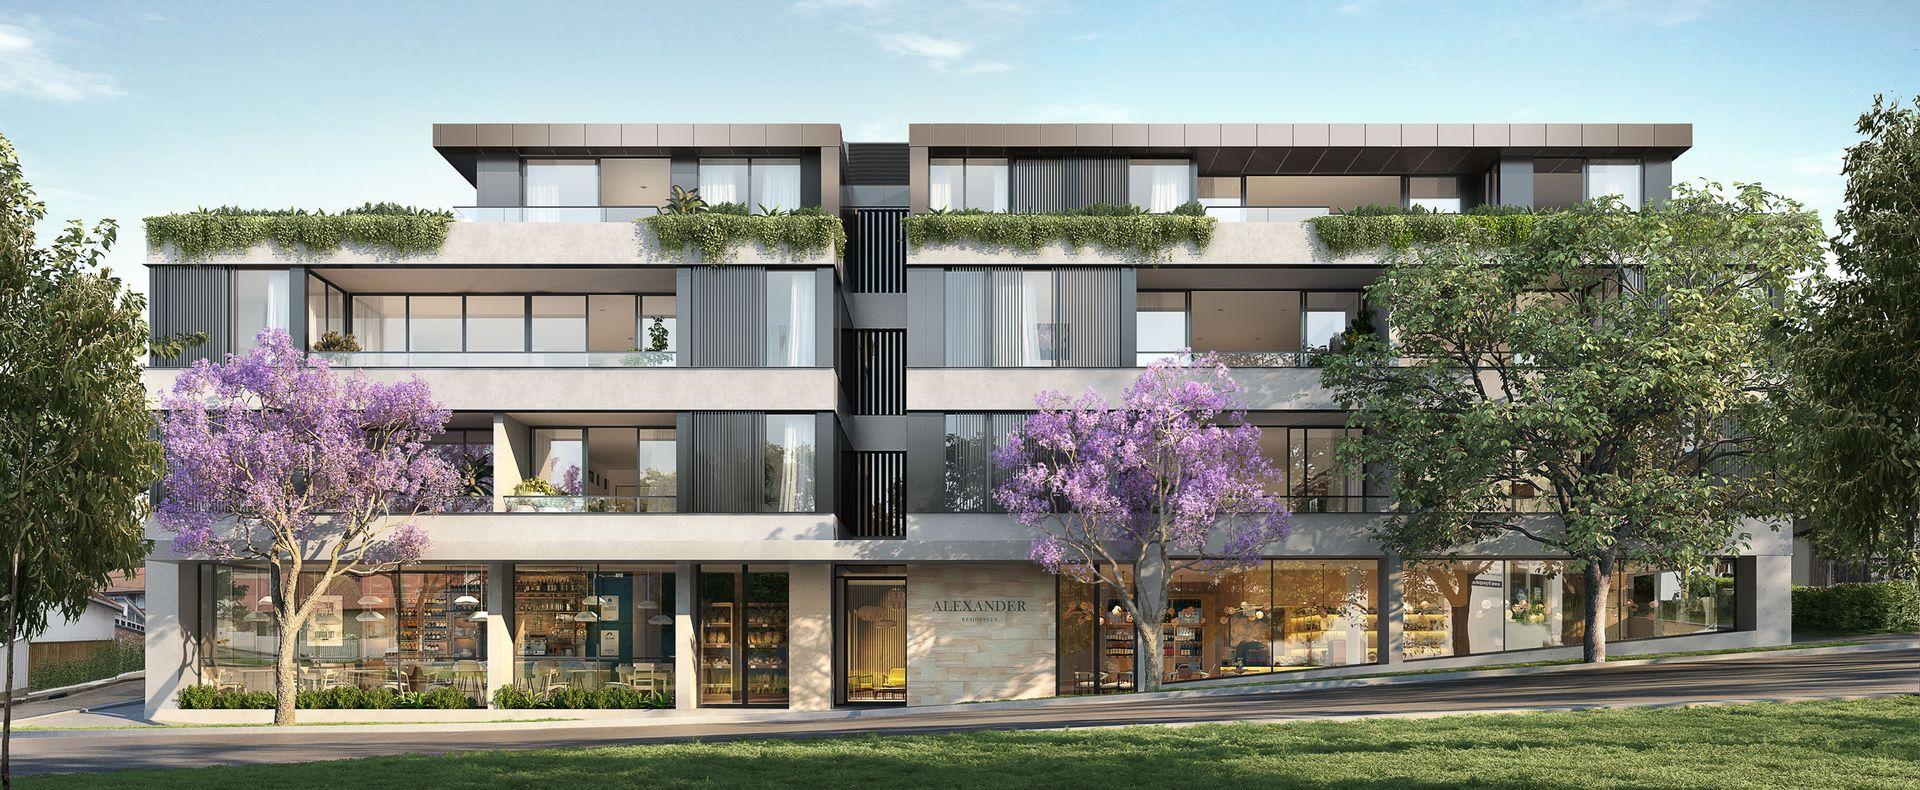 137-139 Alexander Street, Crows Nest NSW 2065, Image 2